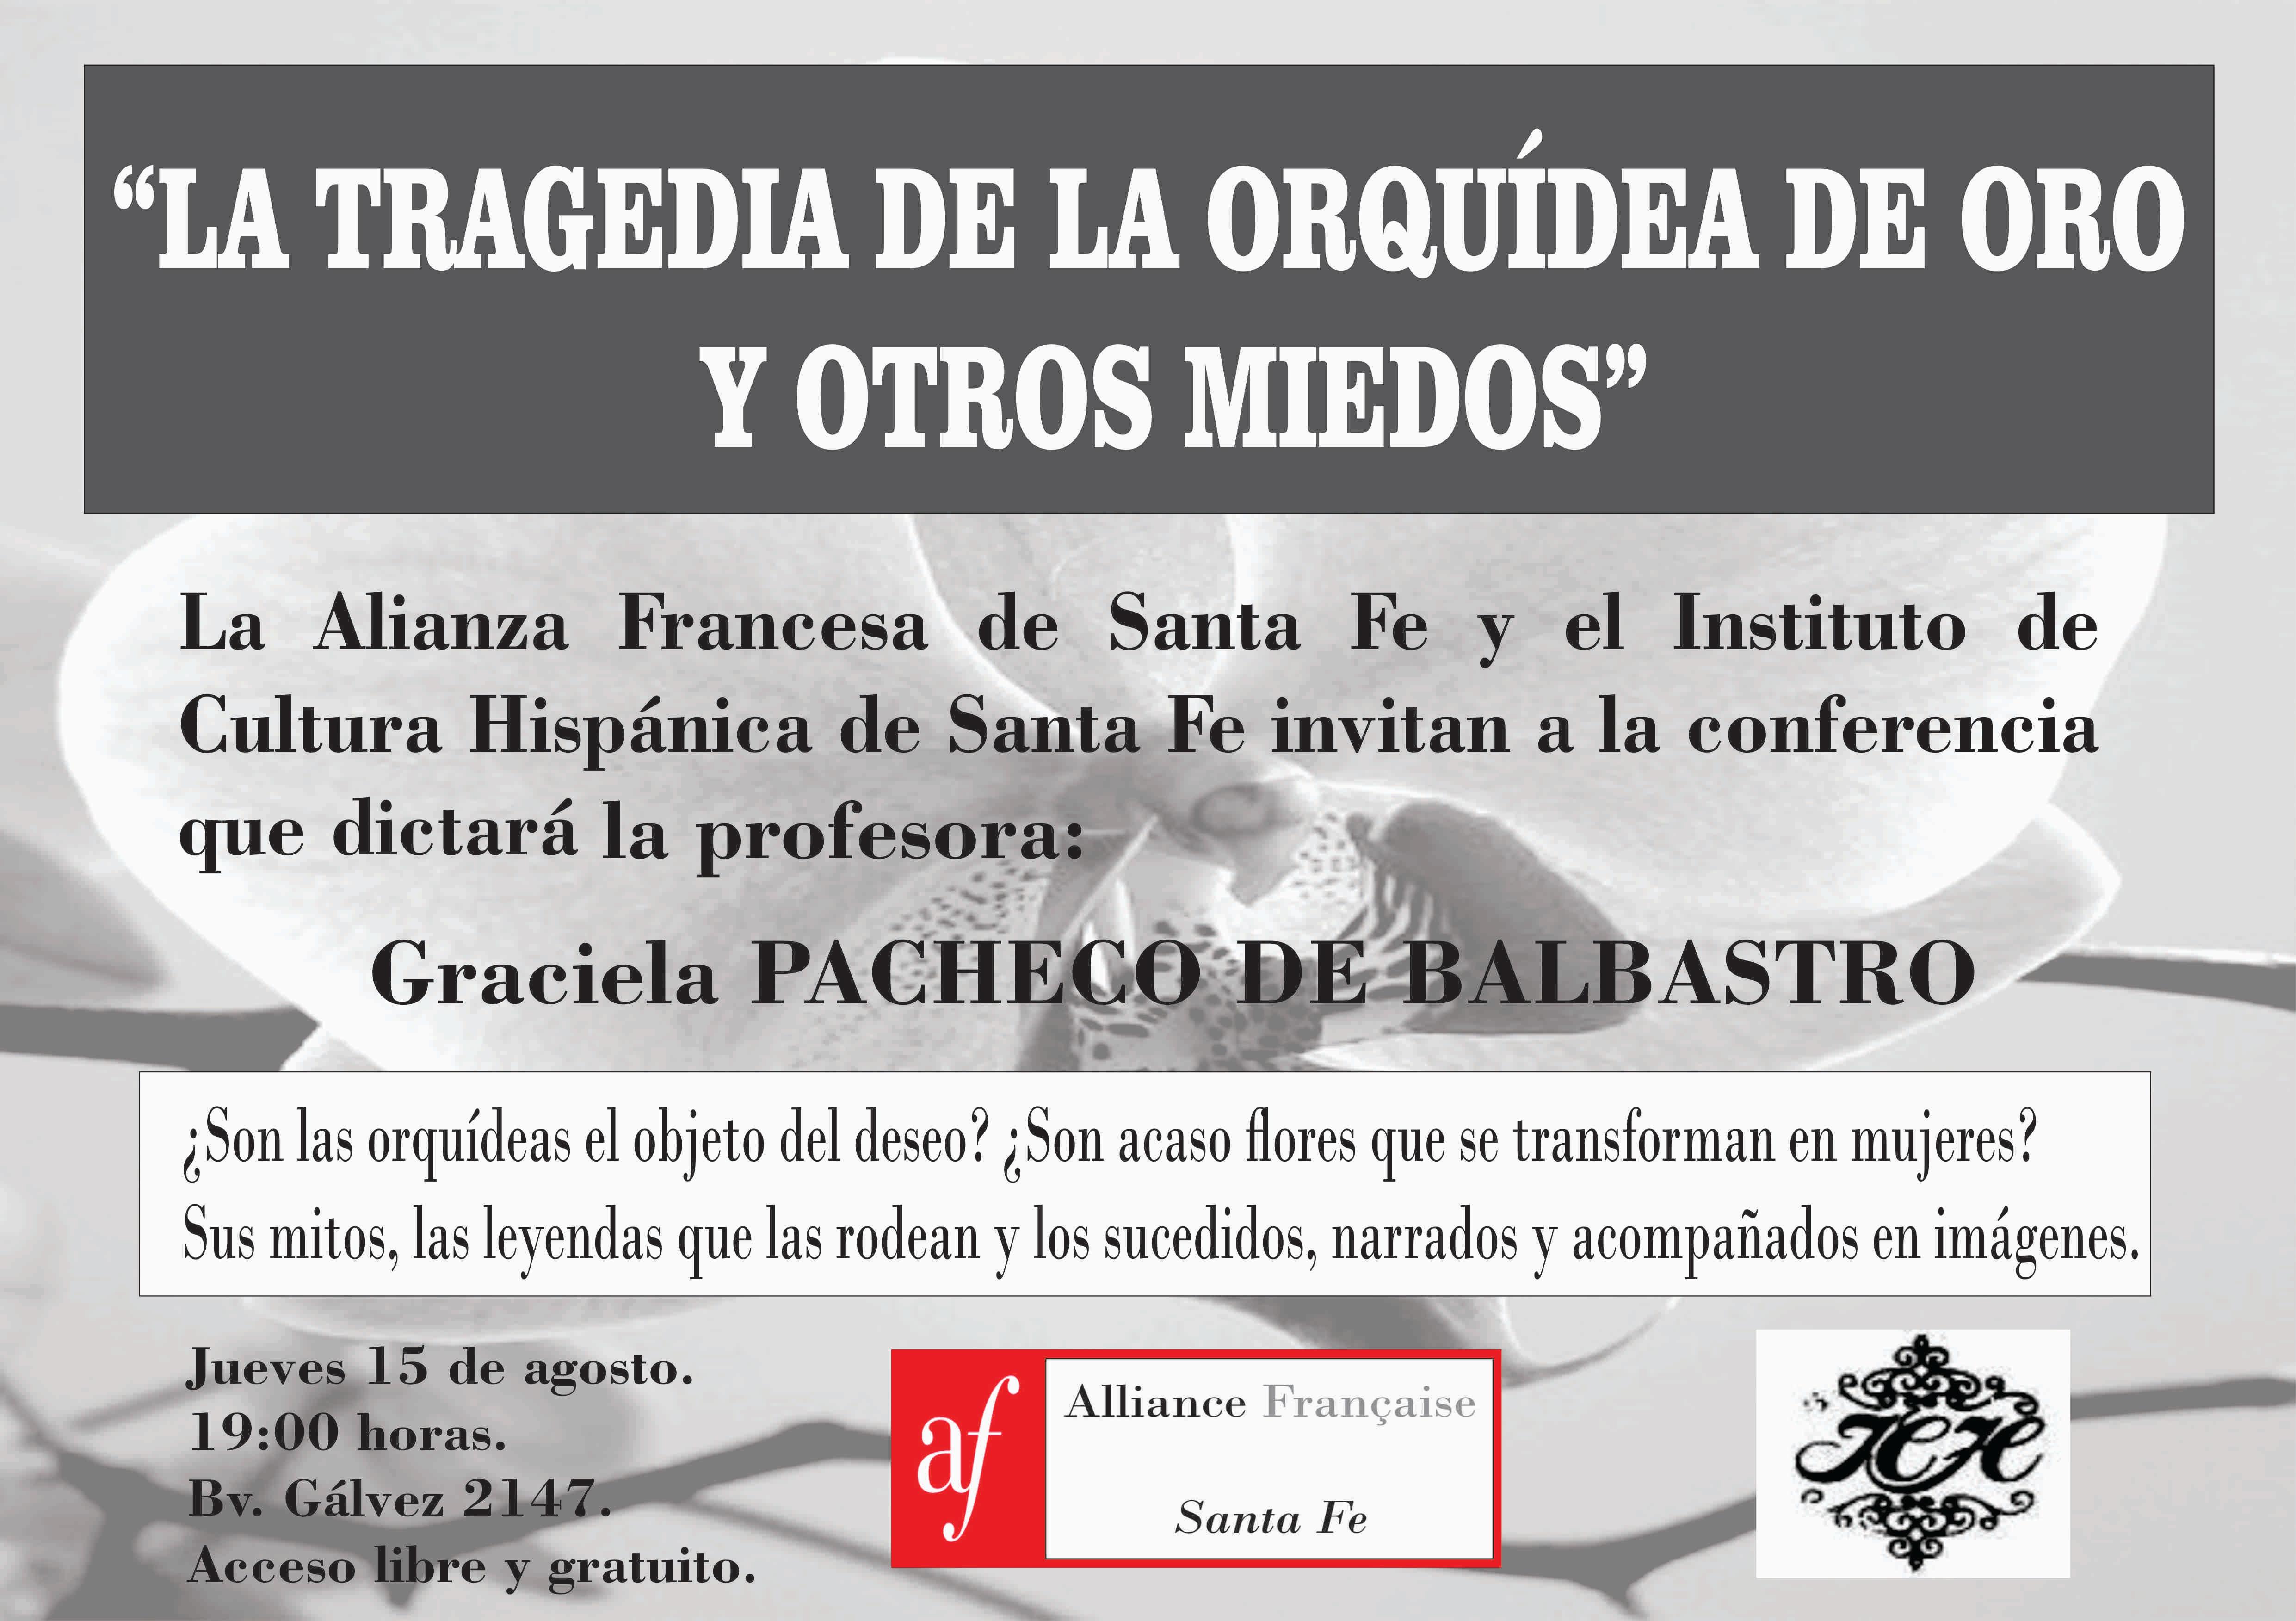 GRACIELA PACHECO BALBASTRO|DISERTACIÓN SOBRE LAS ORQUIDEAS.